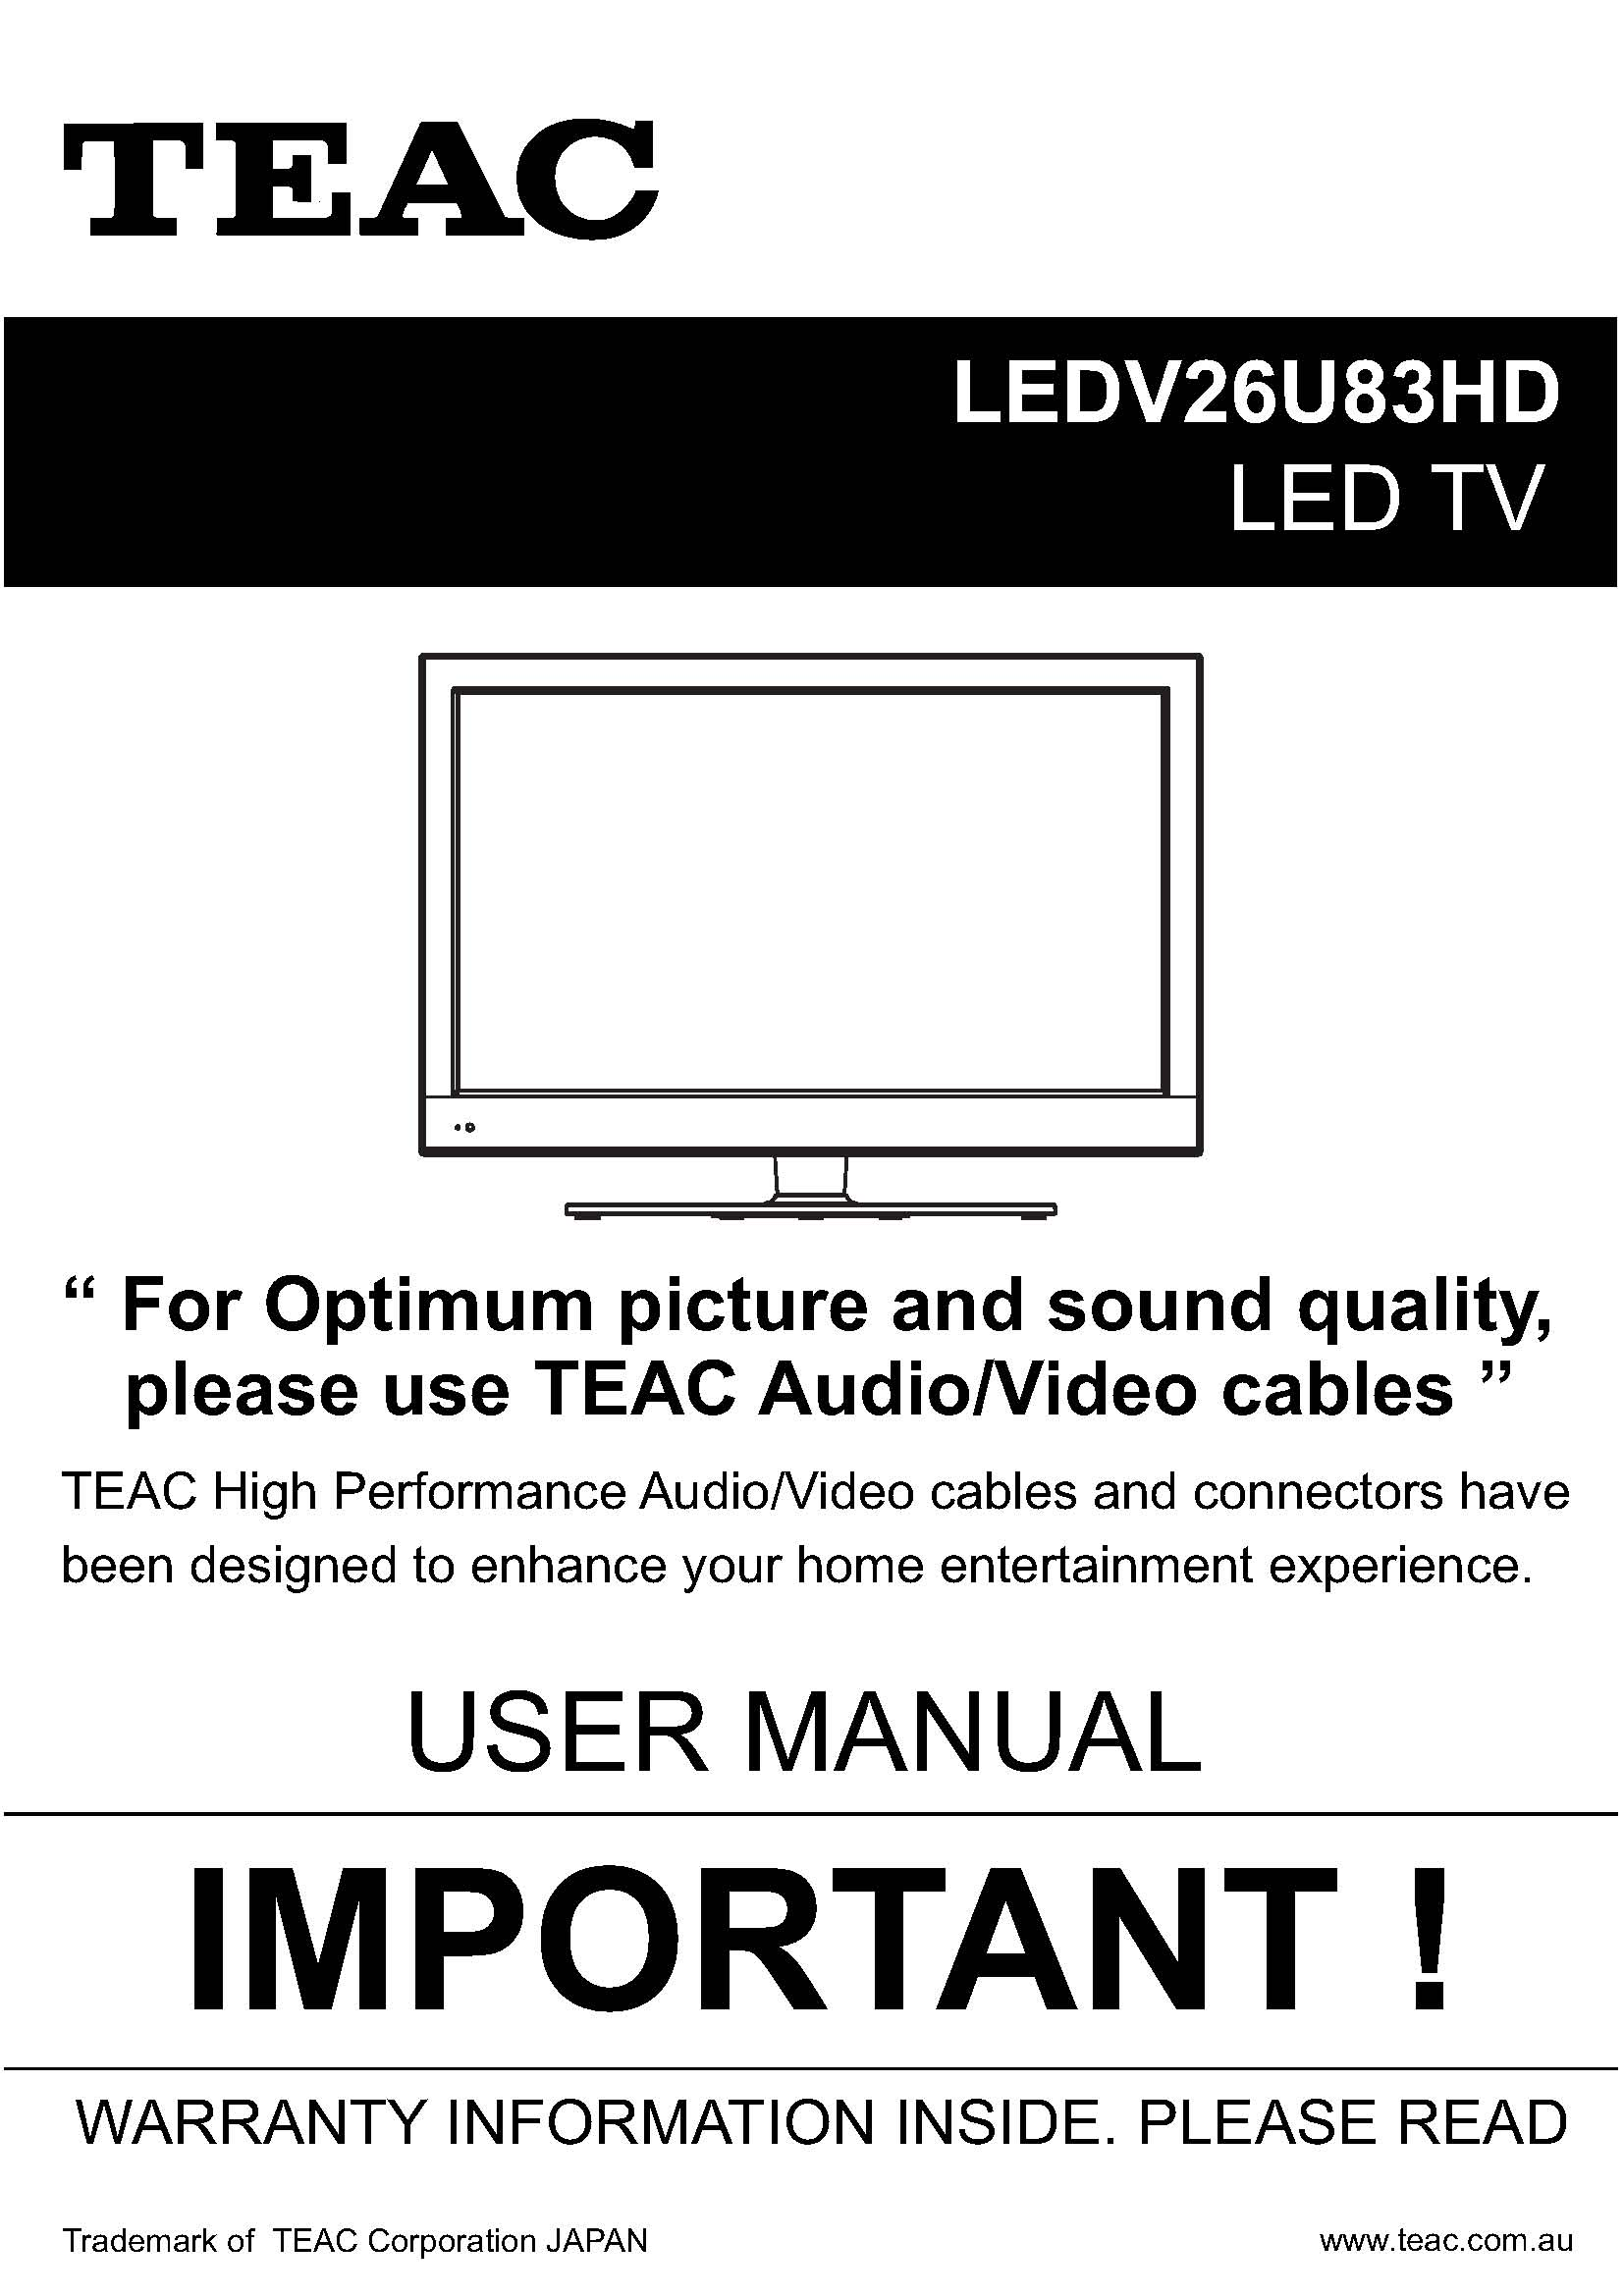 TEAC LEDV26U83HD_User_Manual